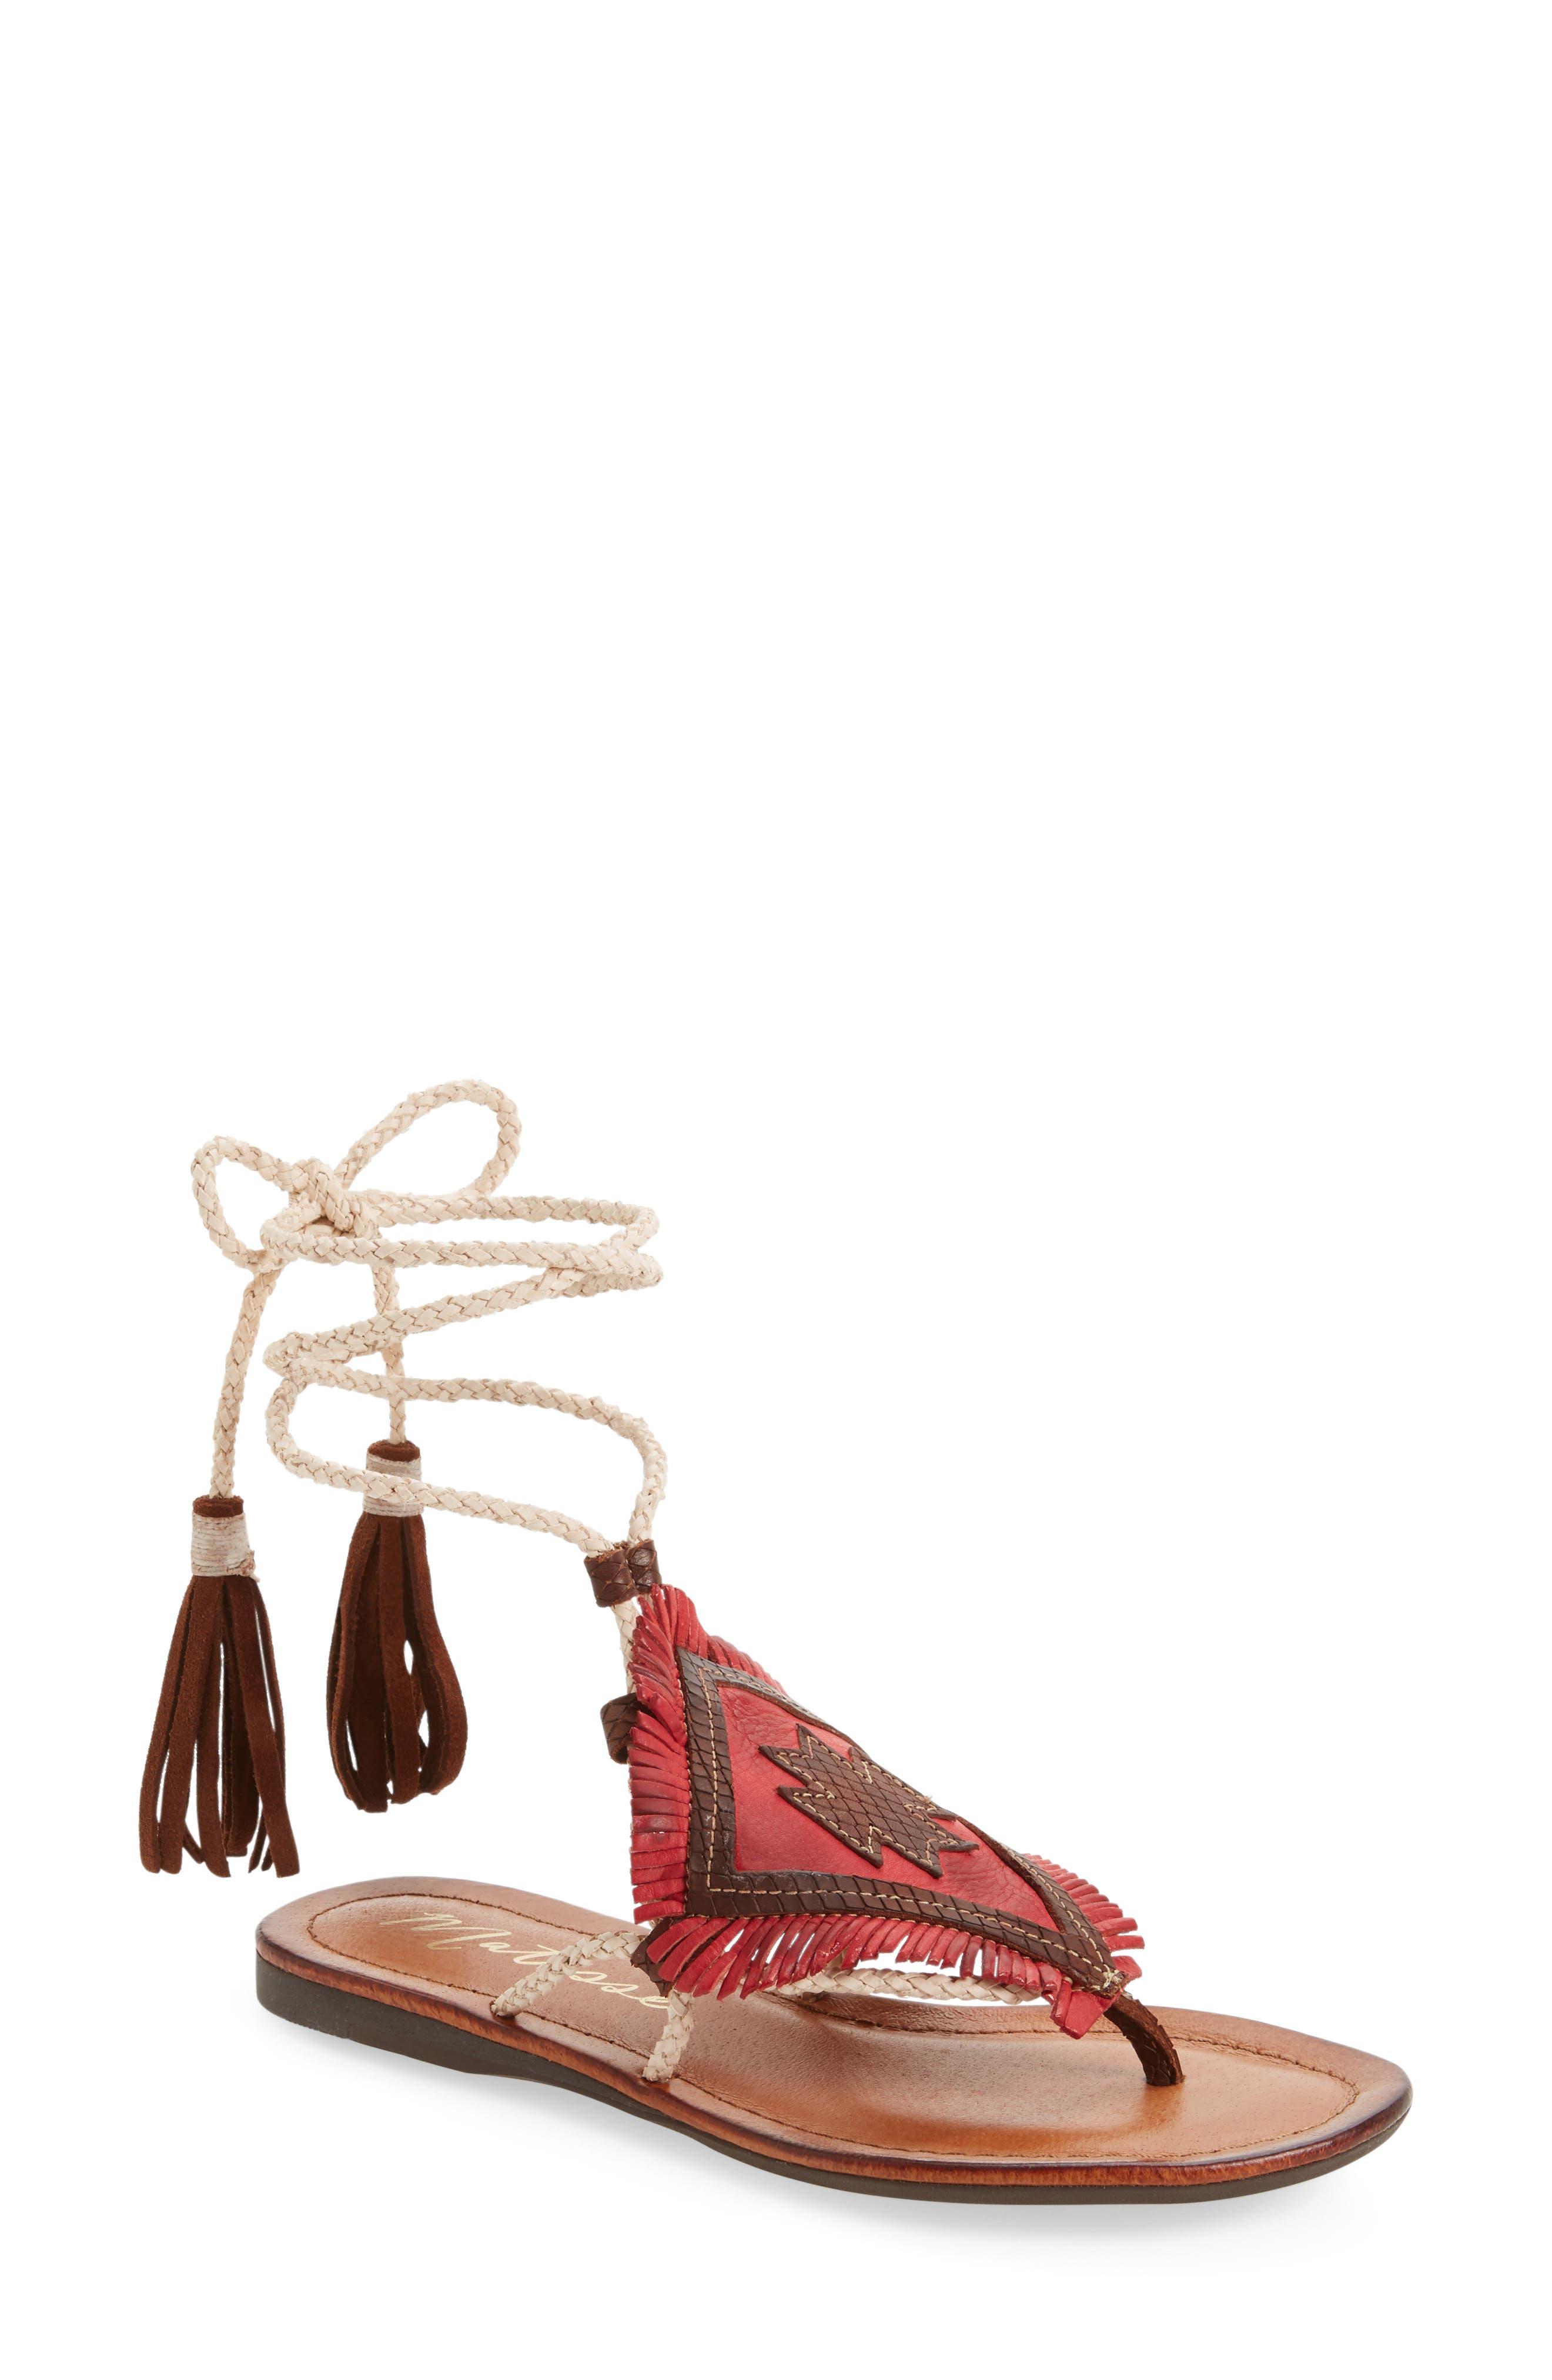 Bronte Tassel Lace-Up Sandal,                             Main thumbnail 2, color,